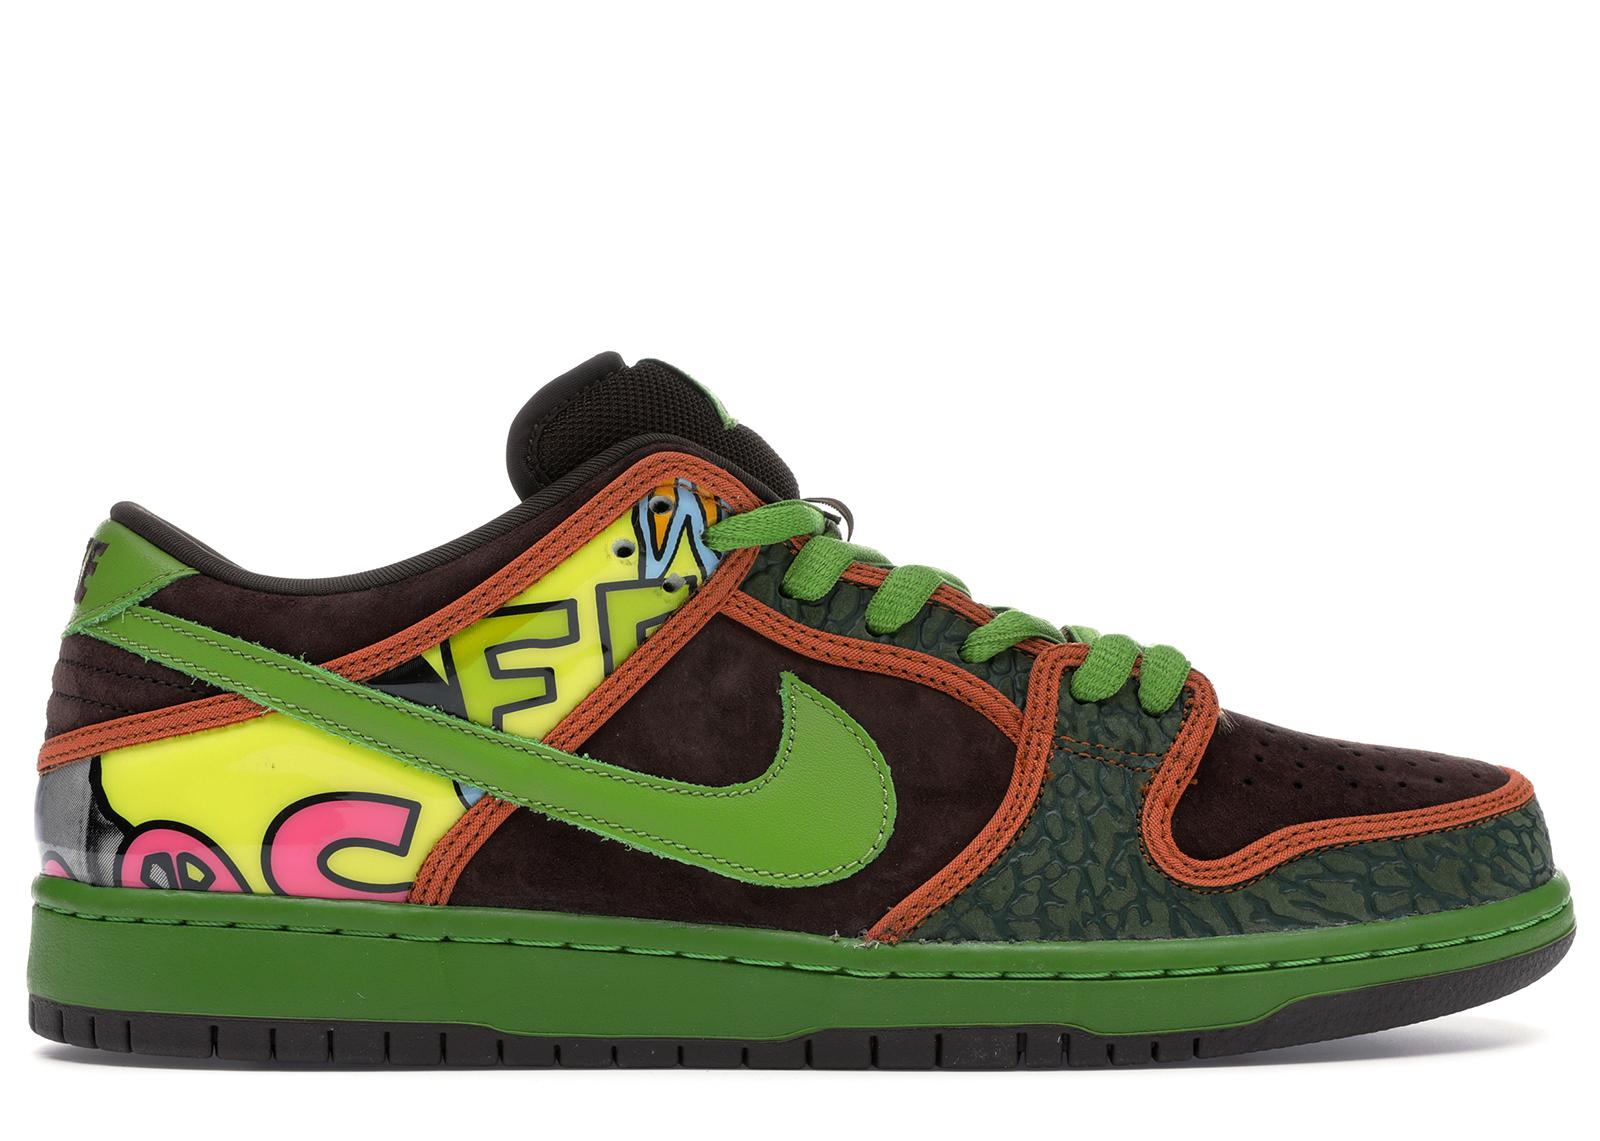 Nike Dunk SB Low De La Soul (2015